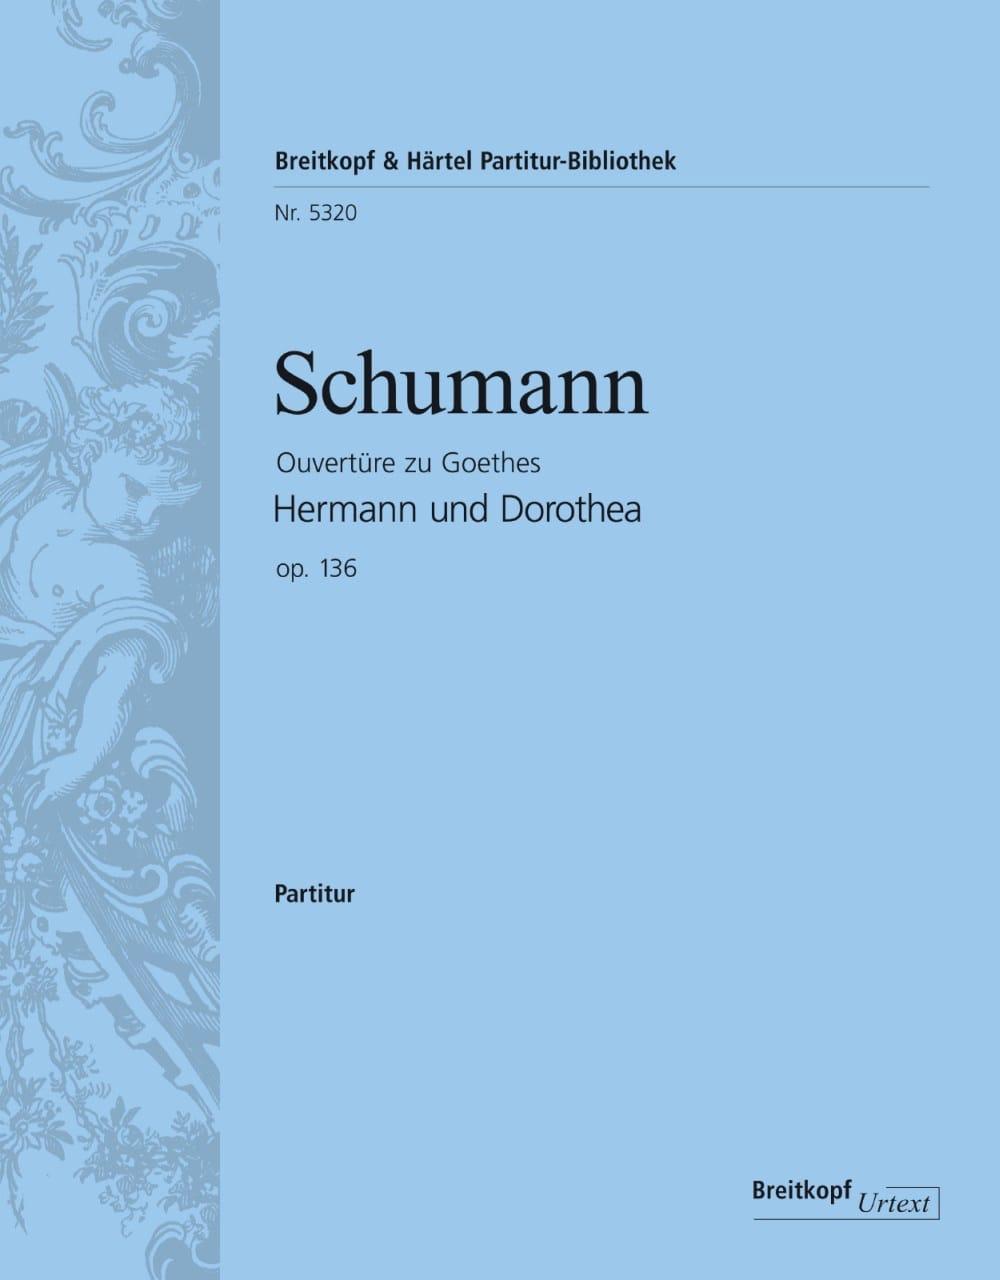 SCHUMANN - Hermann und Dorothea, Opening - Partition - di-arezzo.com